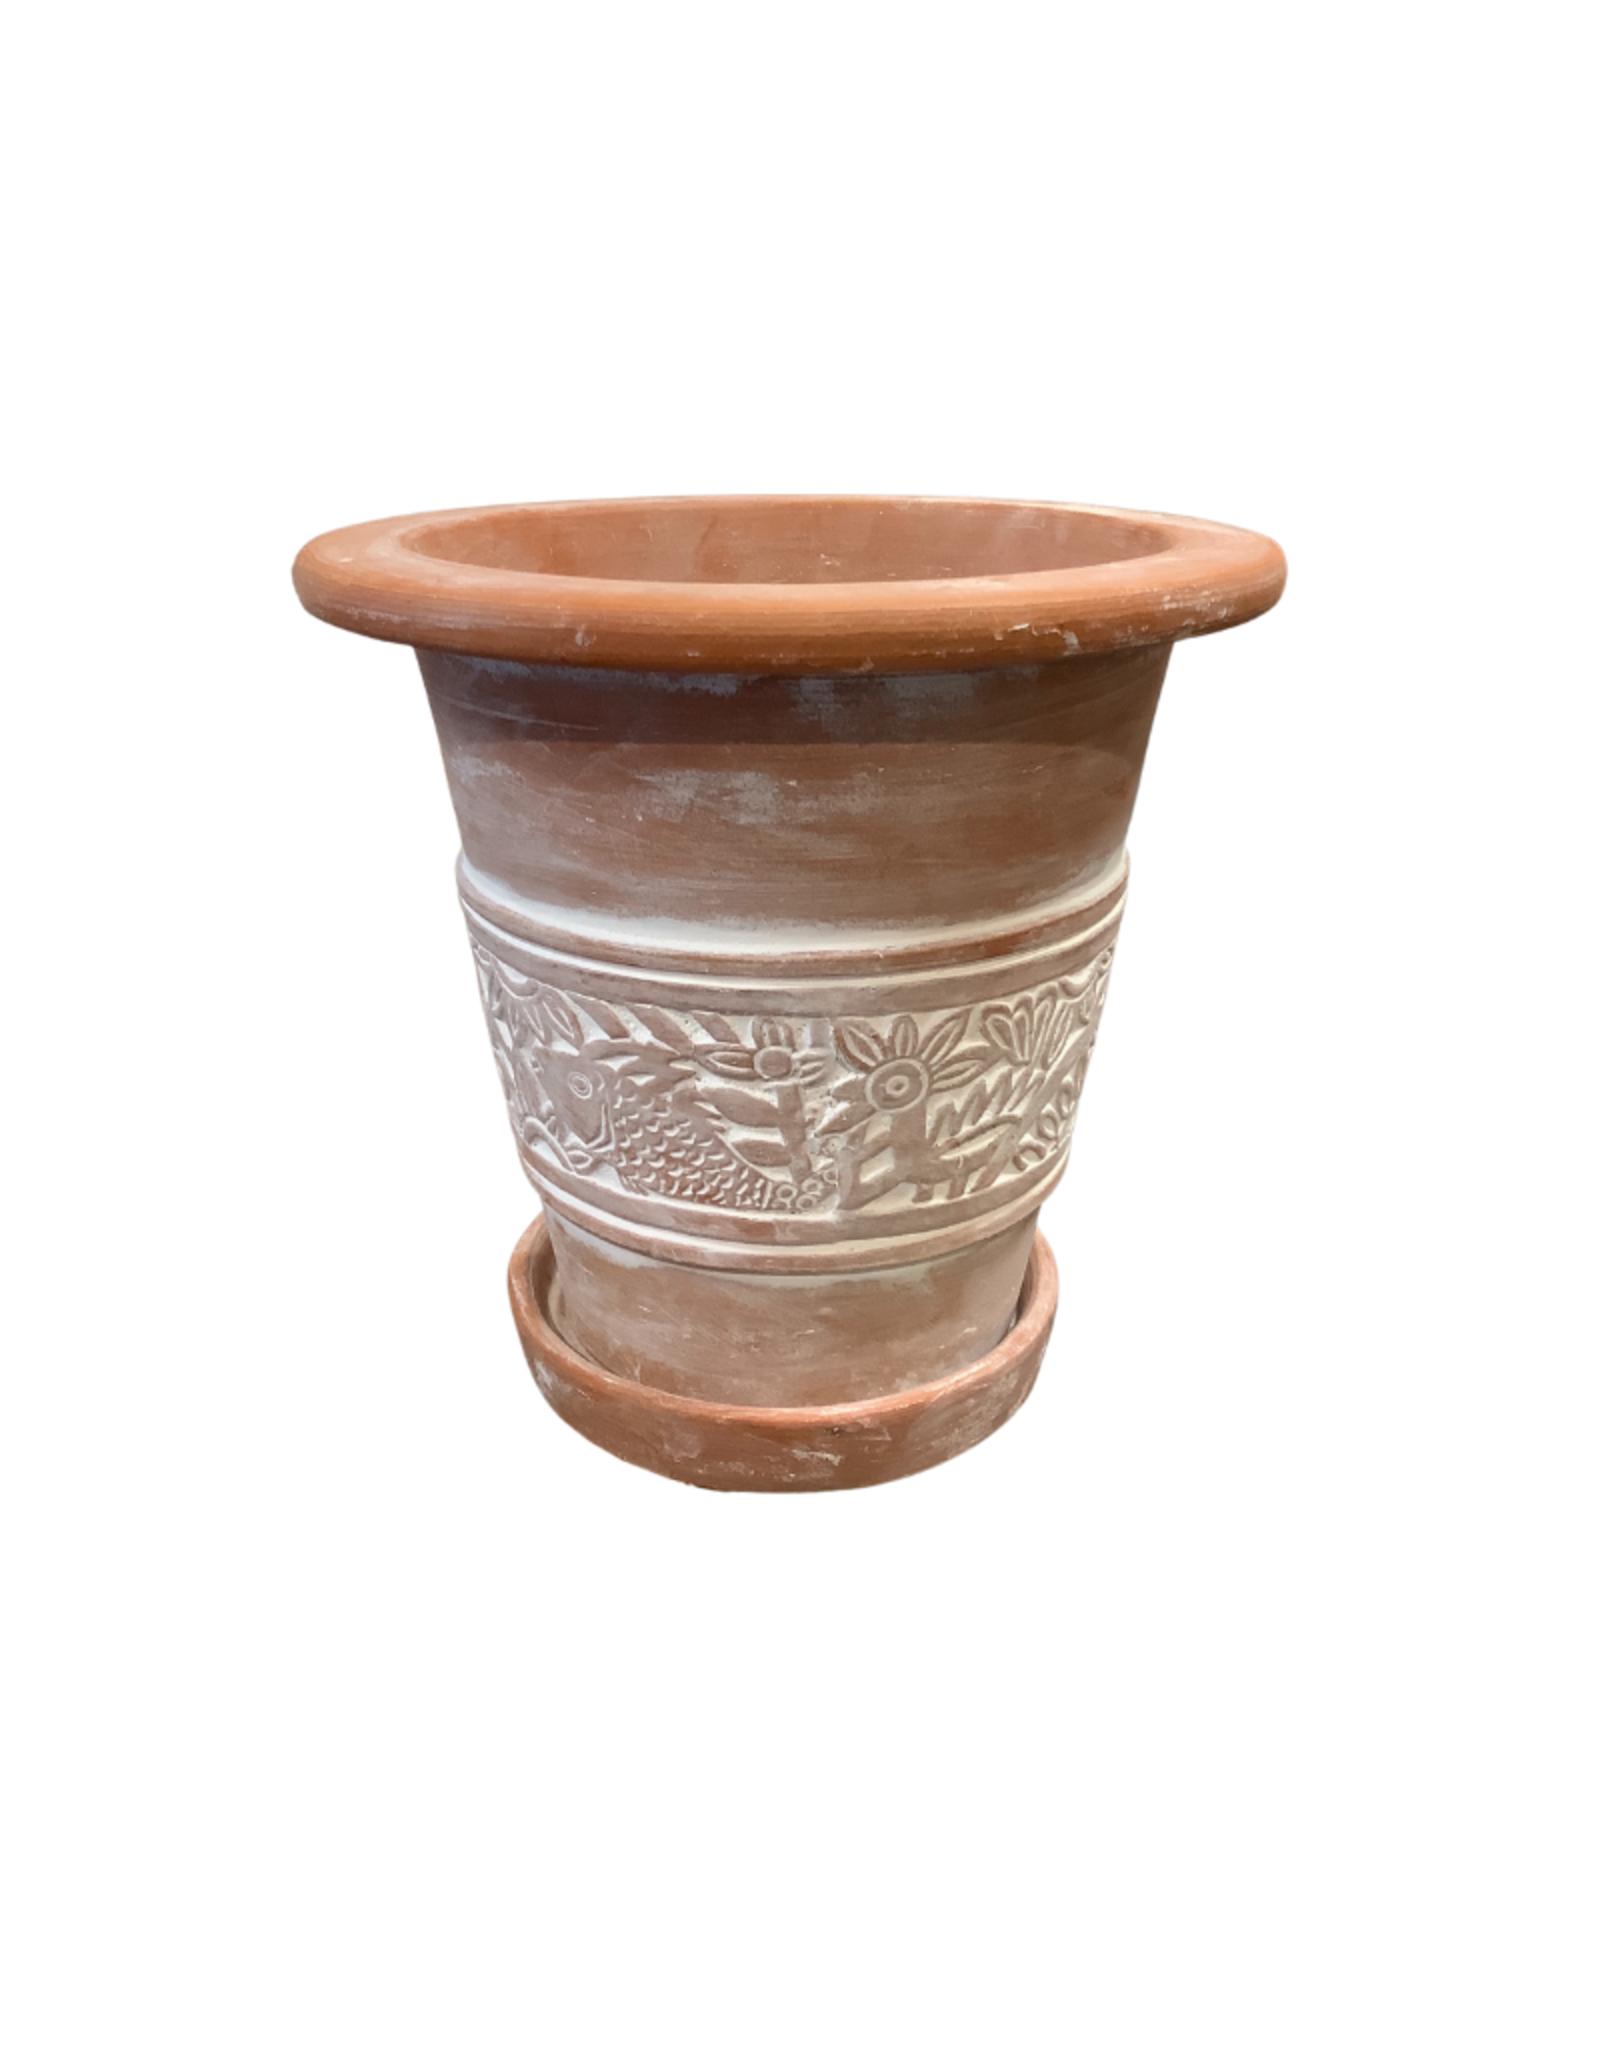 Secret Garden Terracotta Planter (Small)